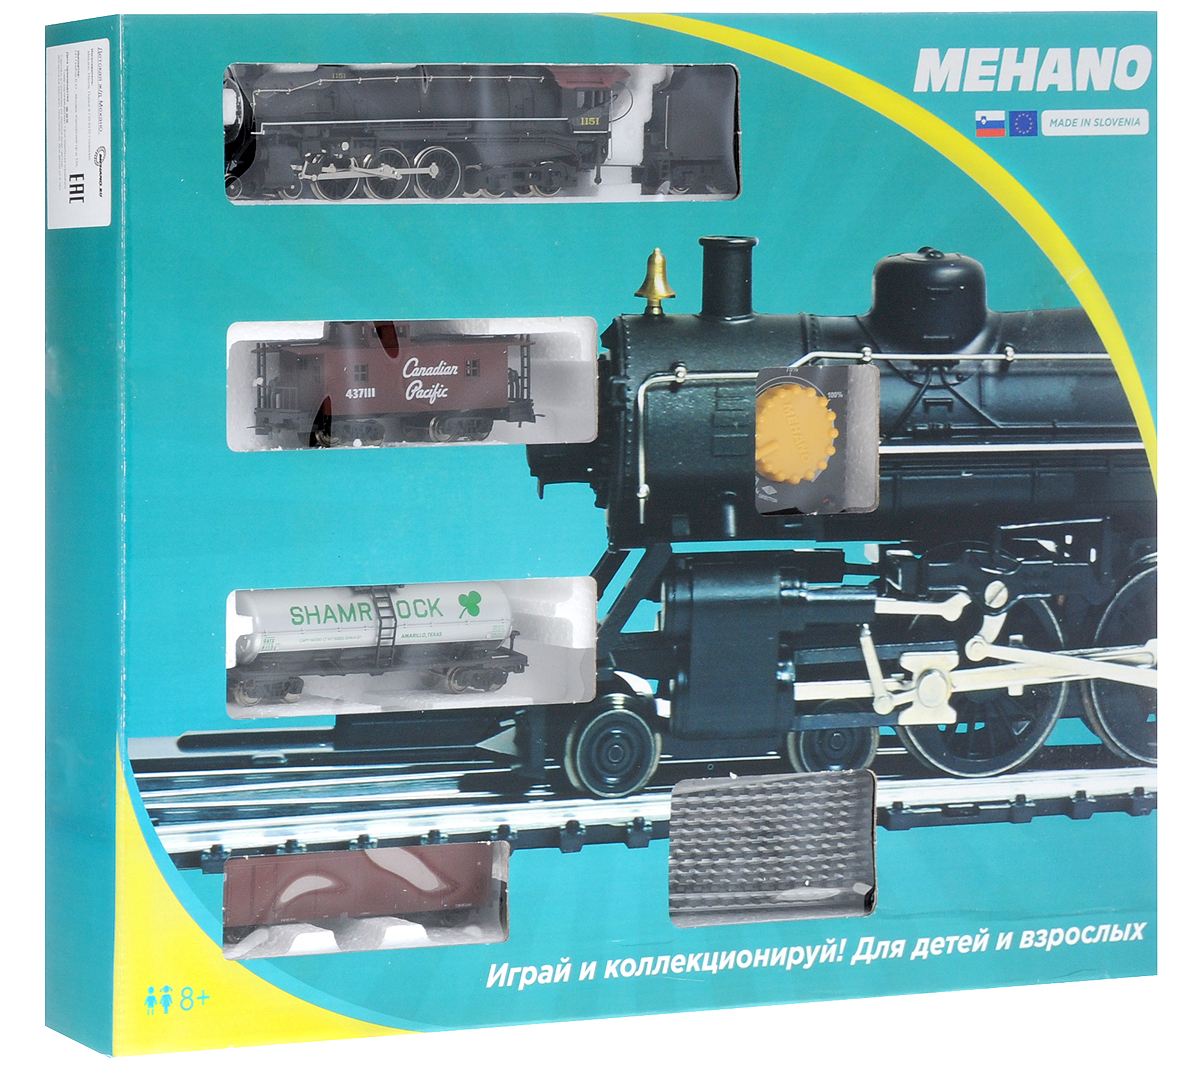 Железная дорога Mehano Prestige паровоз Hudson (4-6-4) с 3-мя вагонами mehano мост c опорами для железной дороги